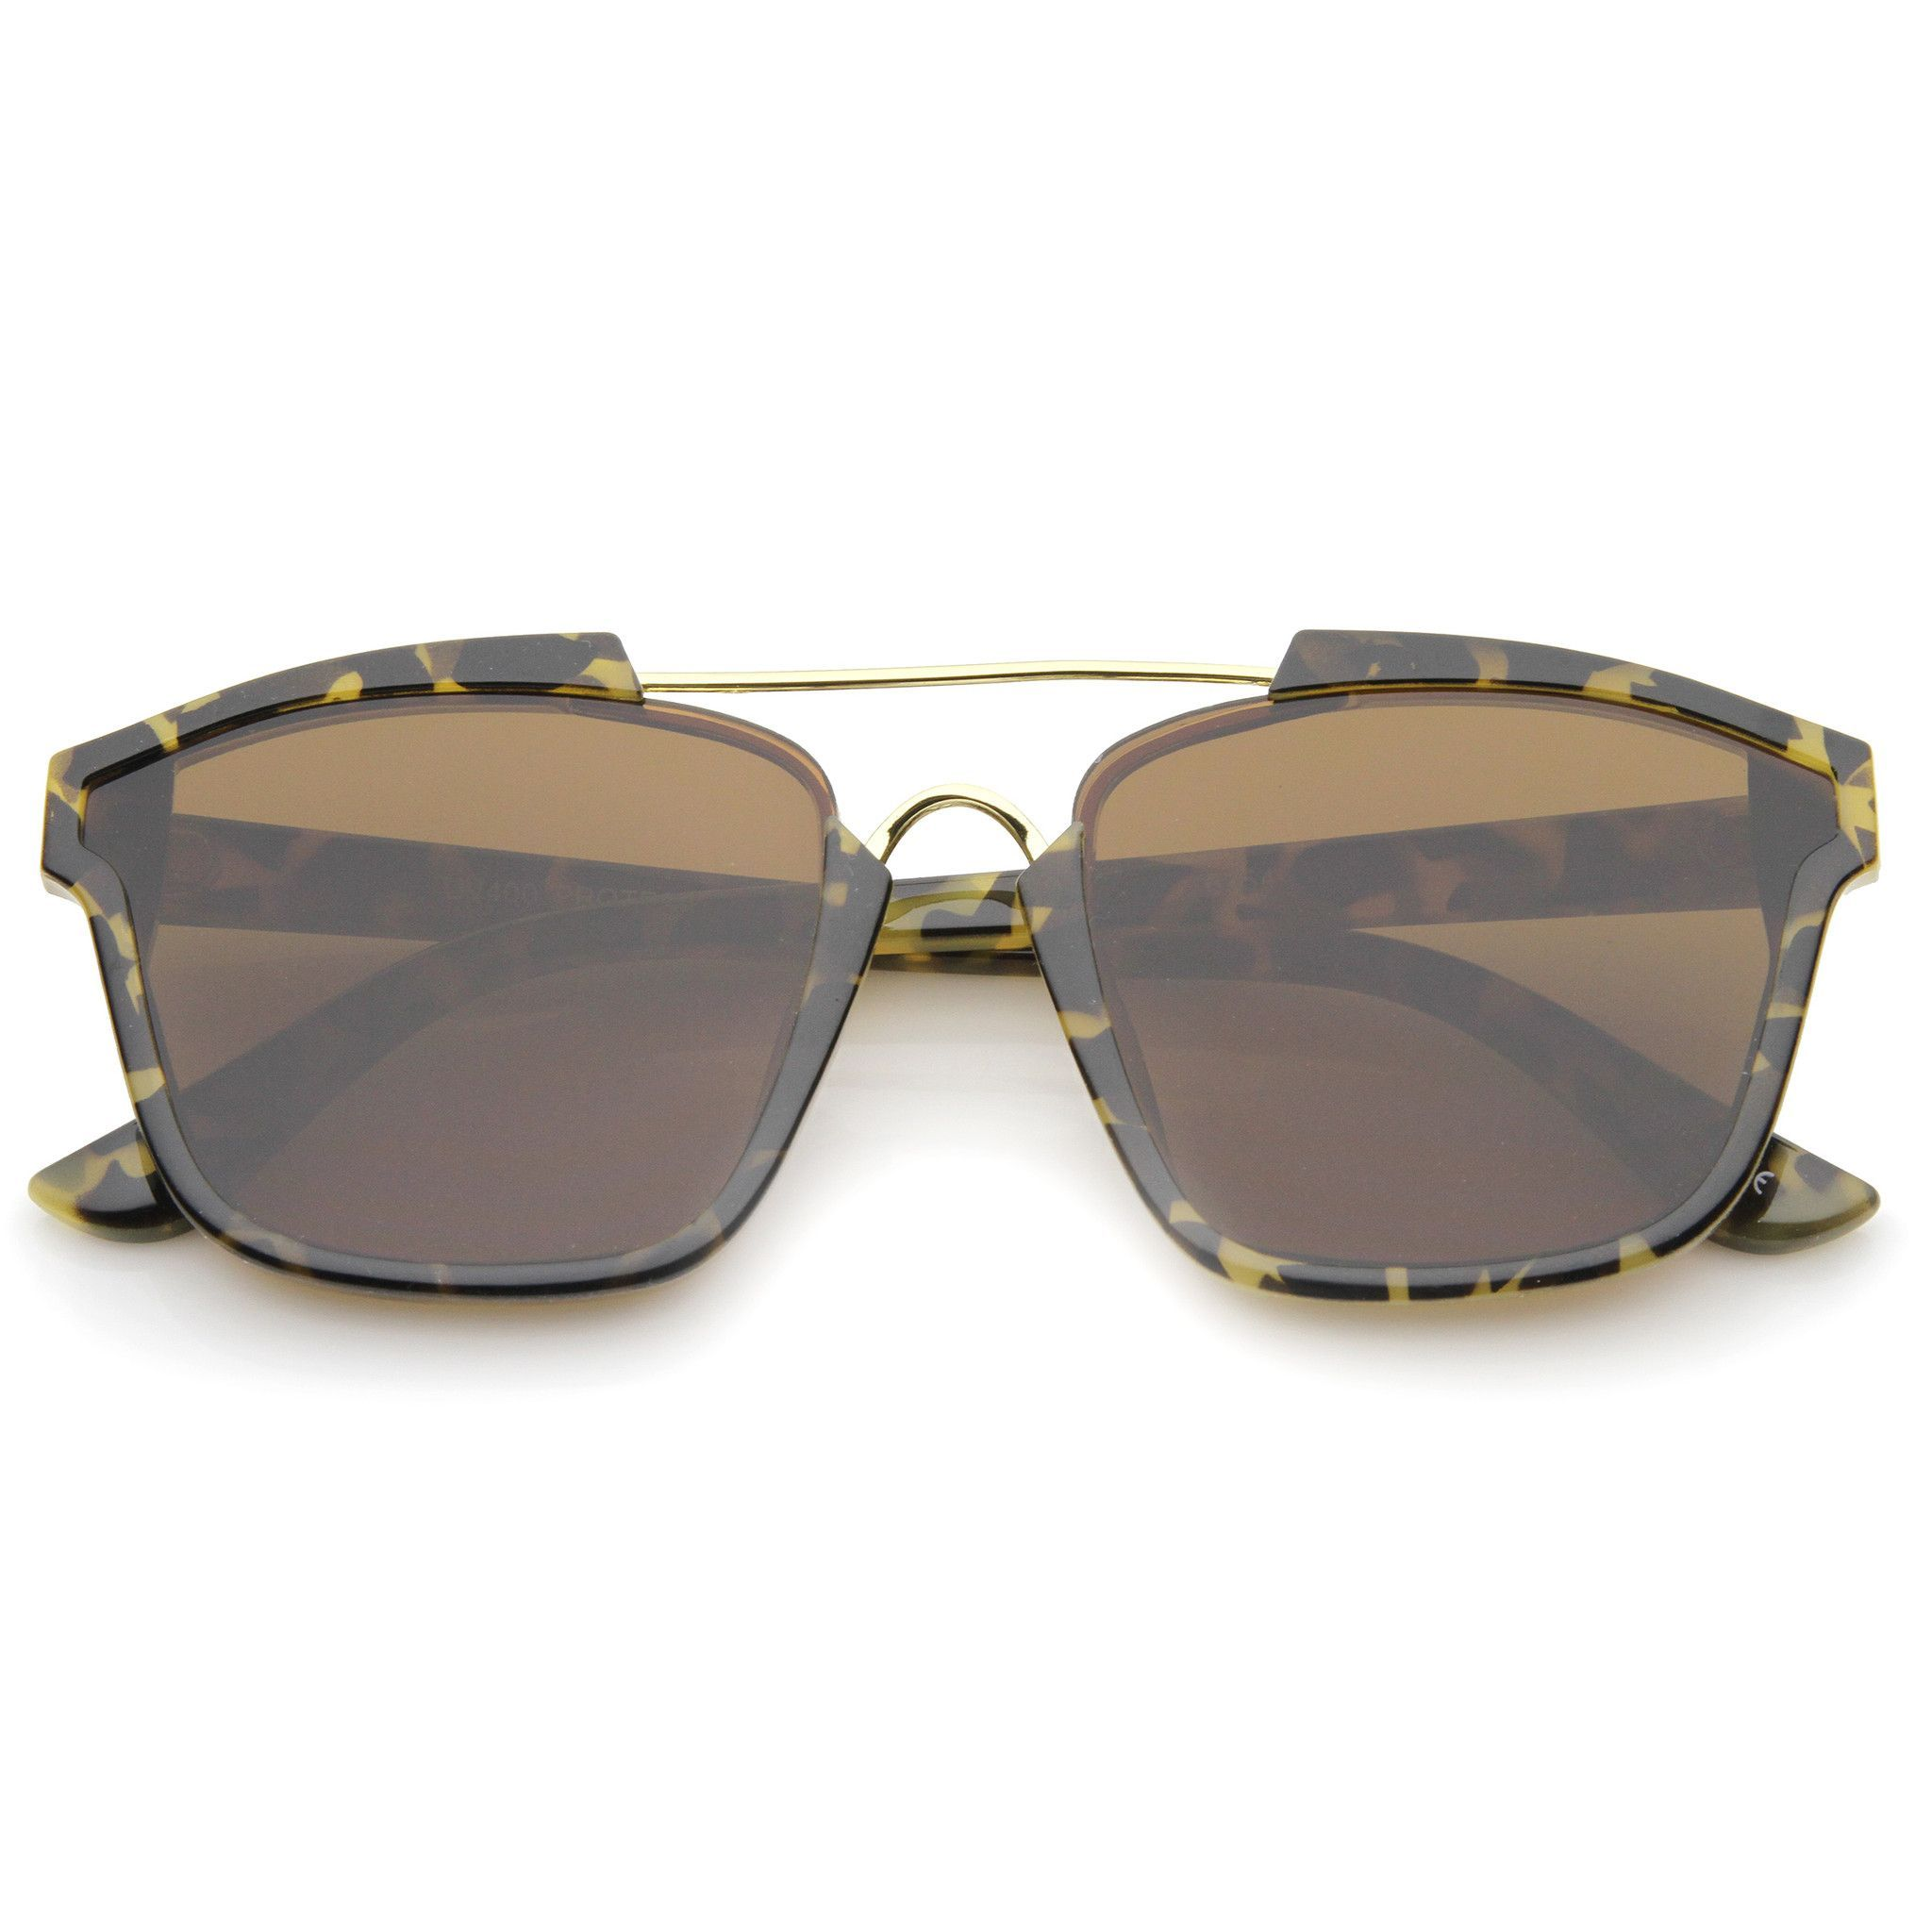 Modern Pinched Brow Flat Lens Aviator Sunglasses A458